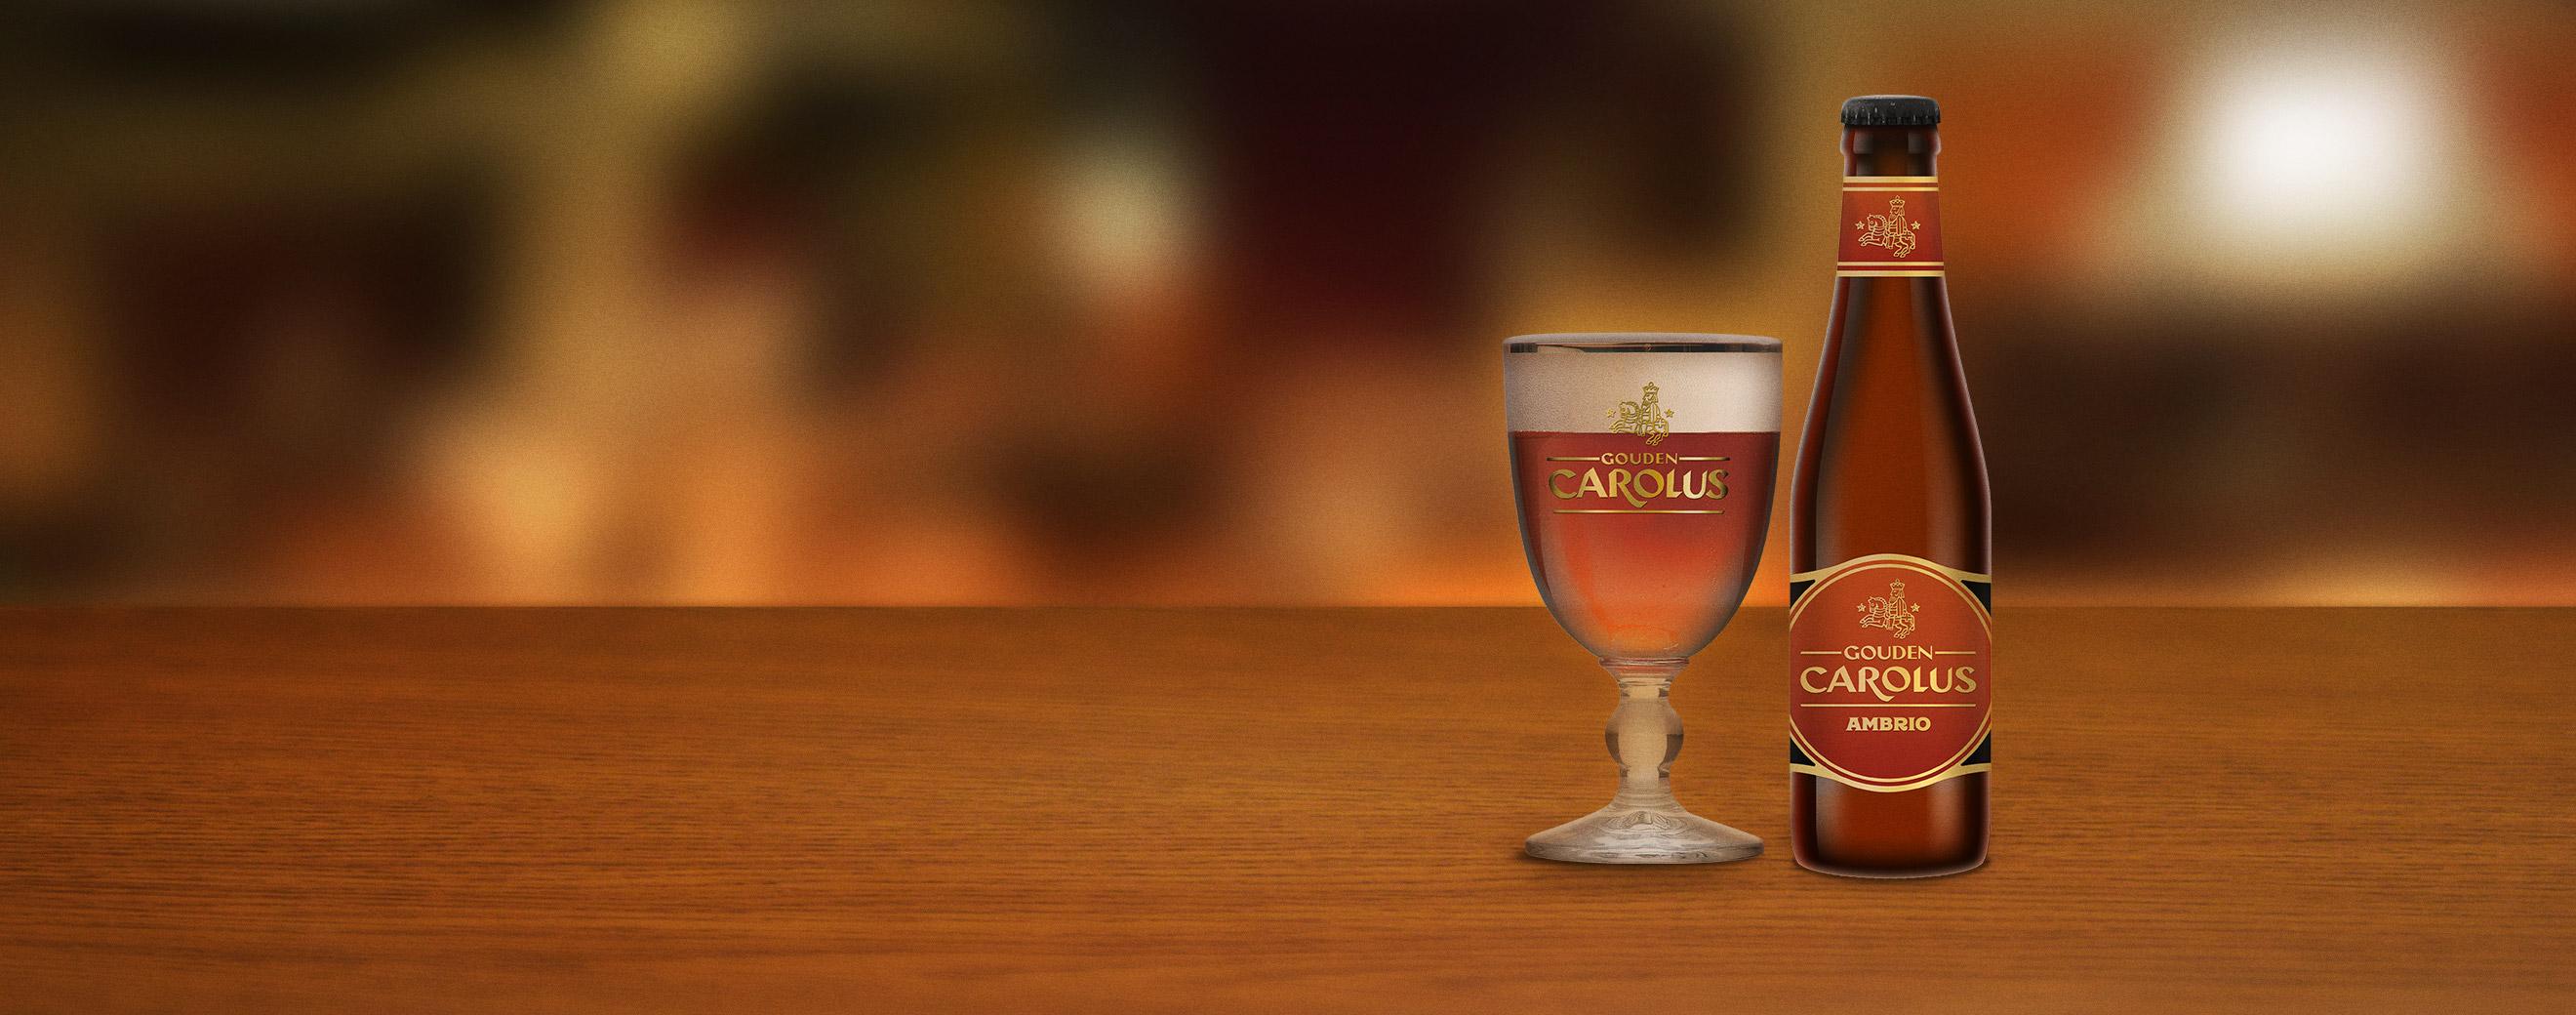 Gouden Carolus Ambrio met glas